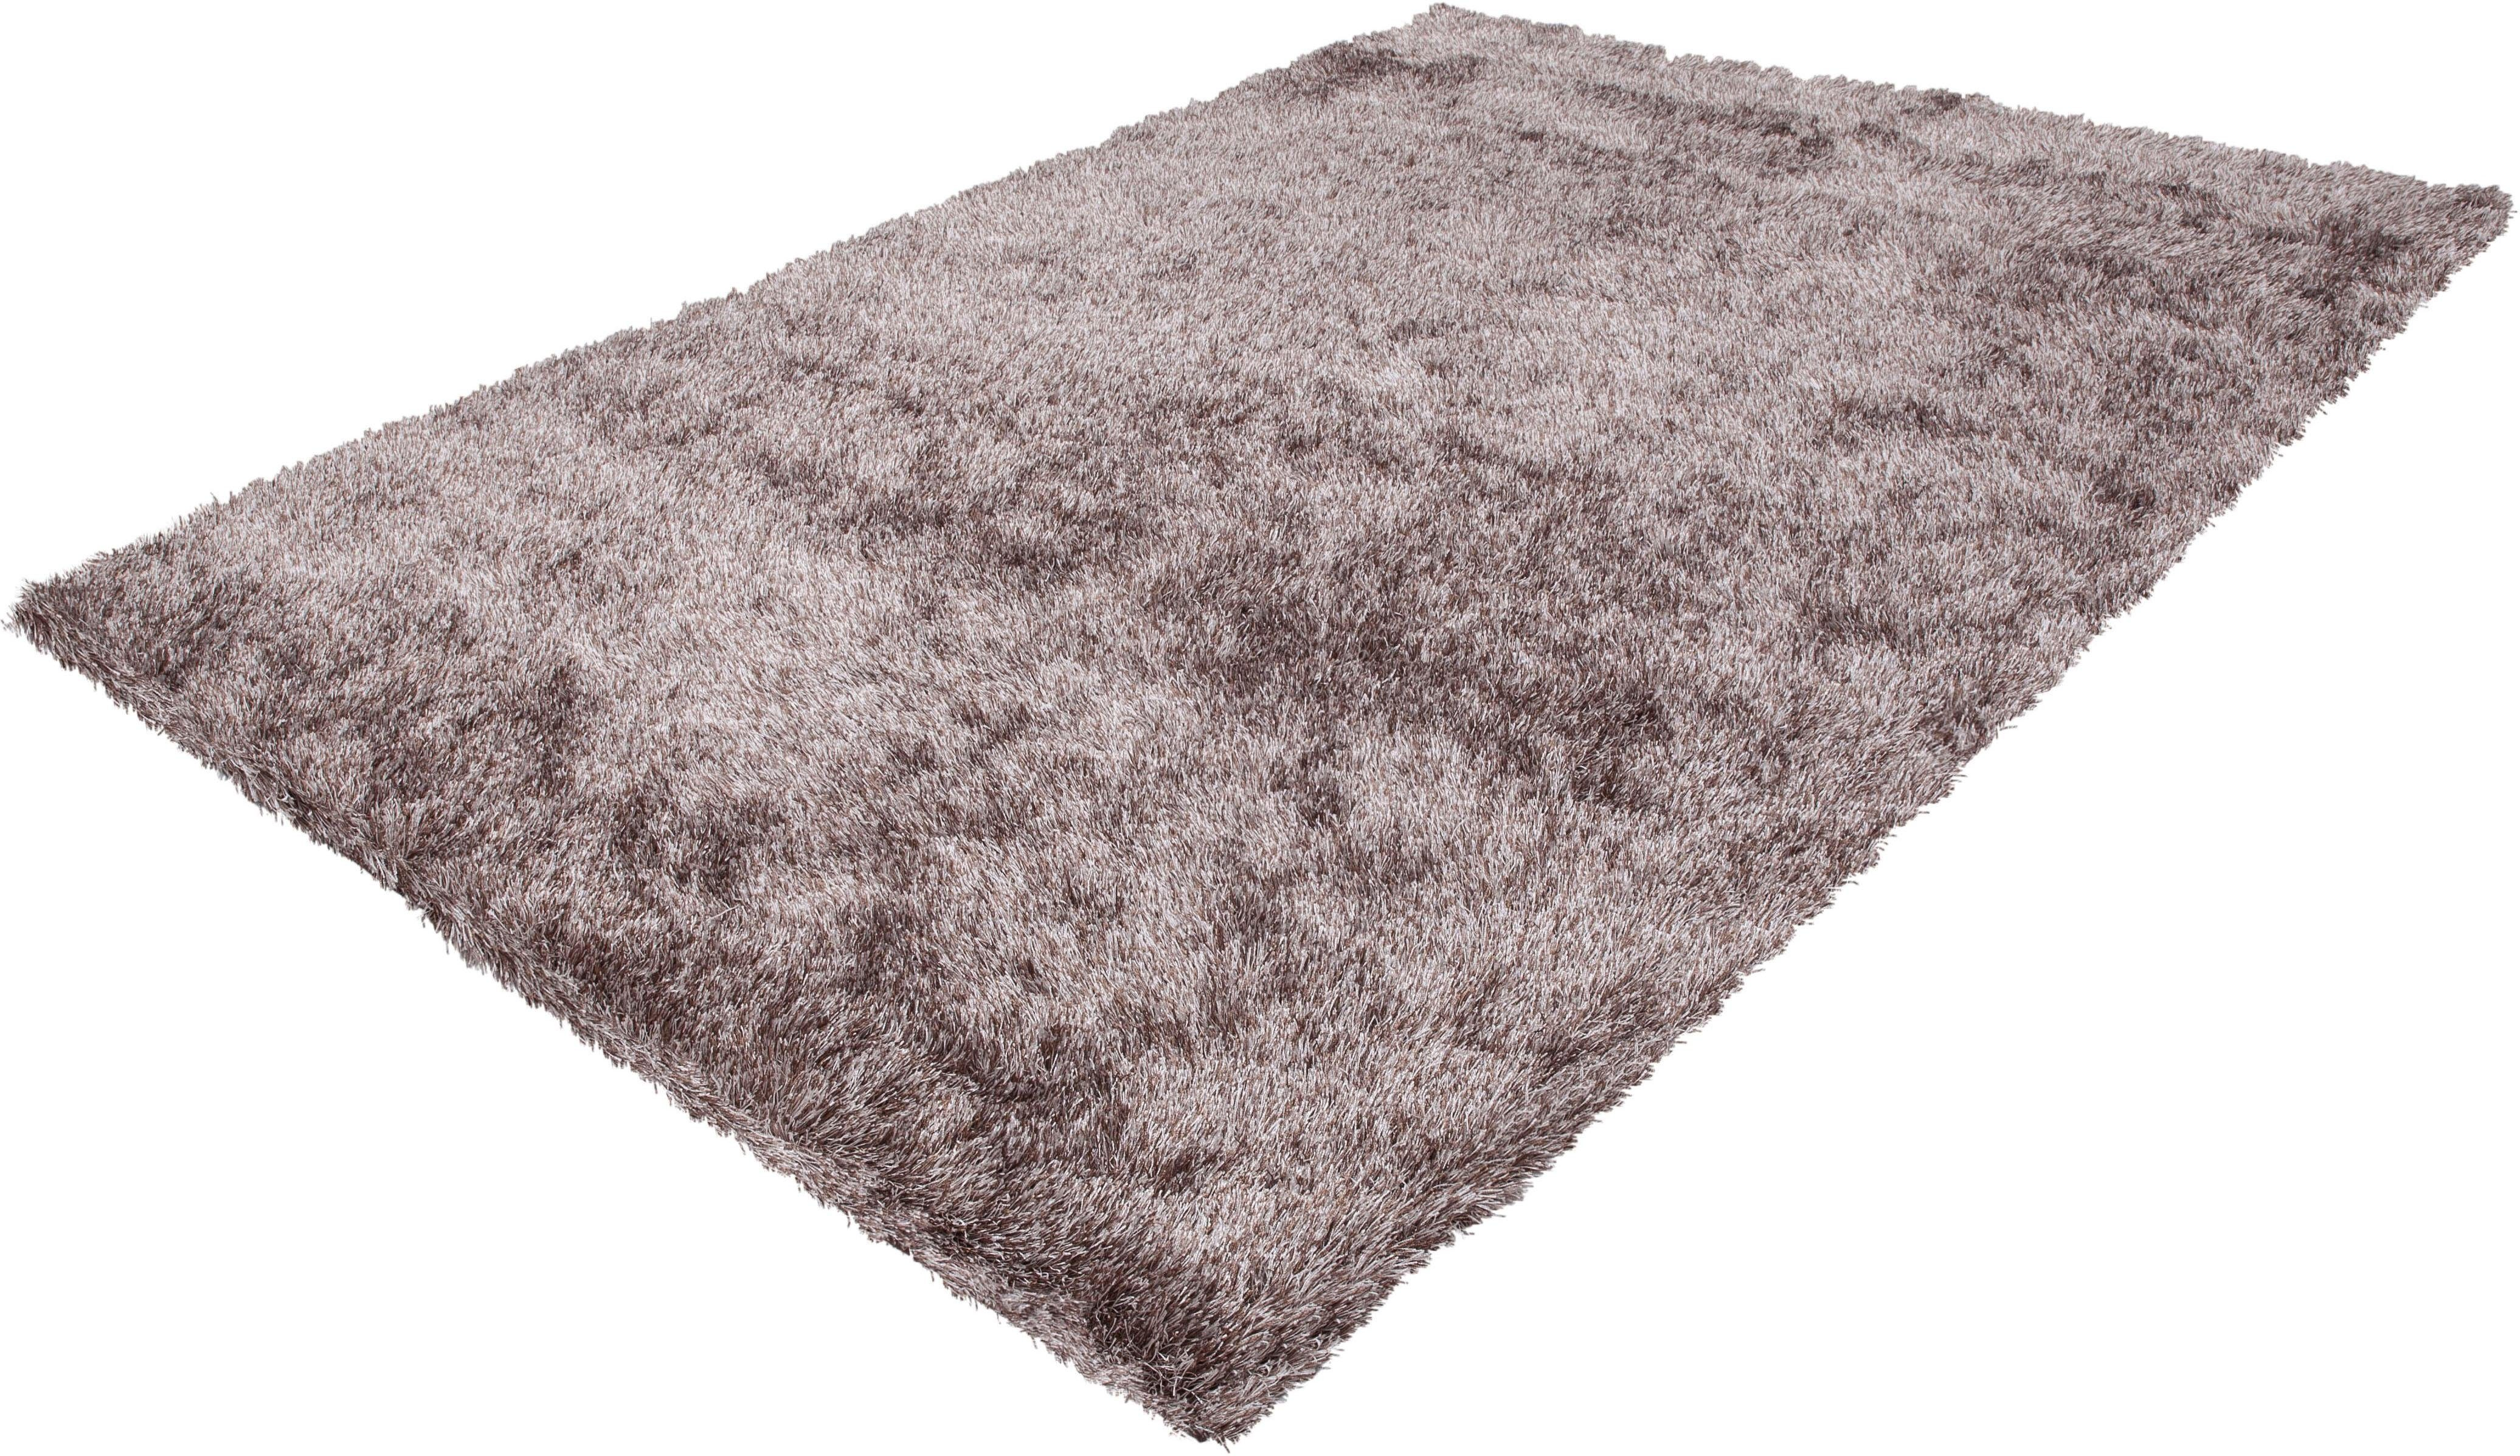 Hochflor-Teppich Masada 900 calo-deluxe rechteckig Höhe 40 mm handgewebt